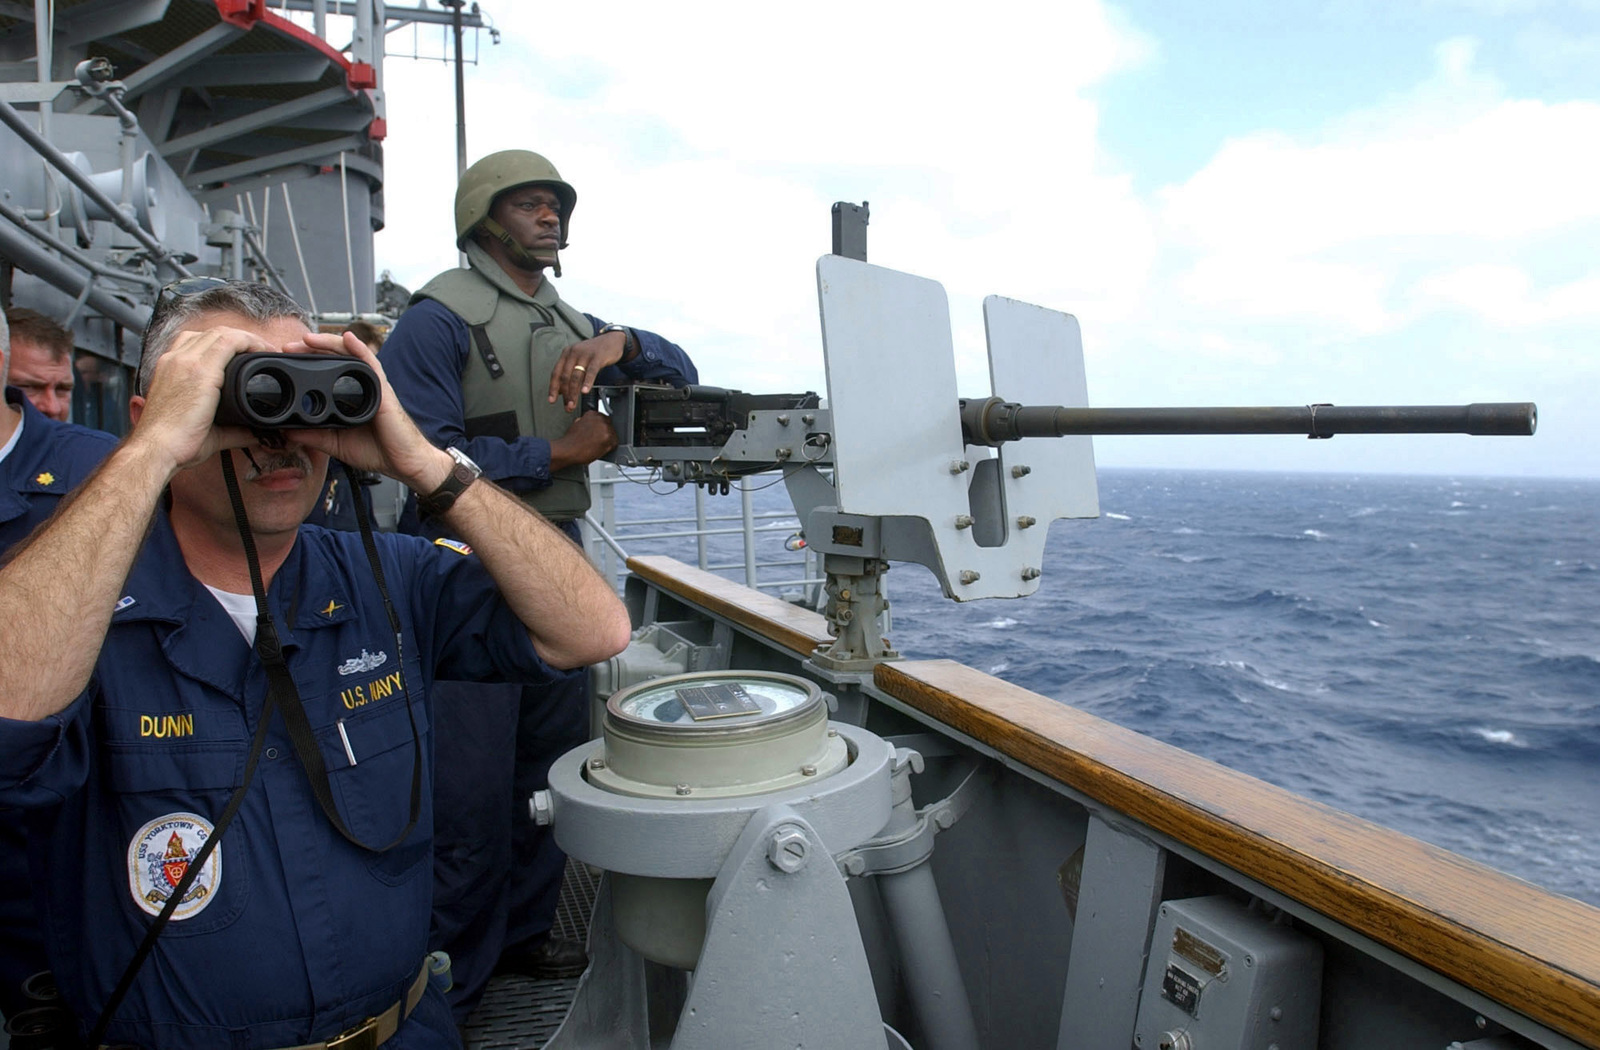 US Navy (USN) CHIEF Warrant Officer (CWO) Bill Dunn uses